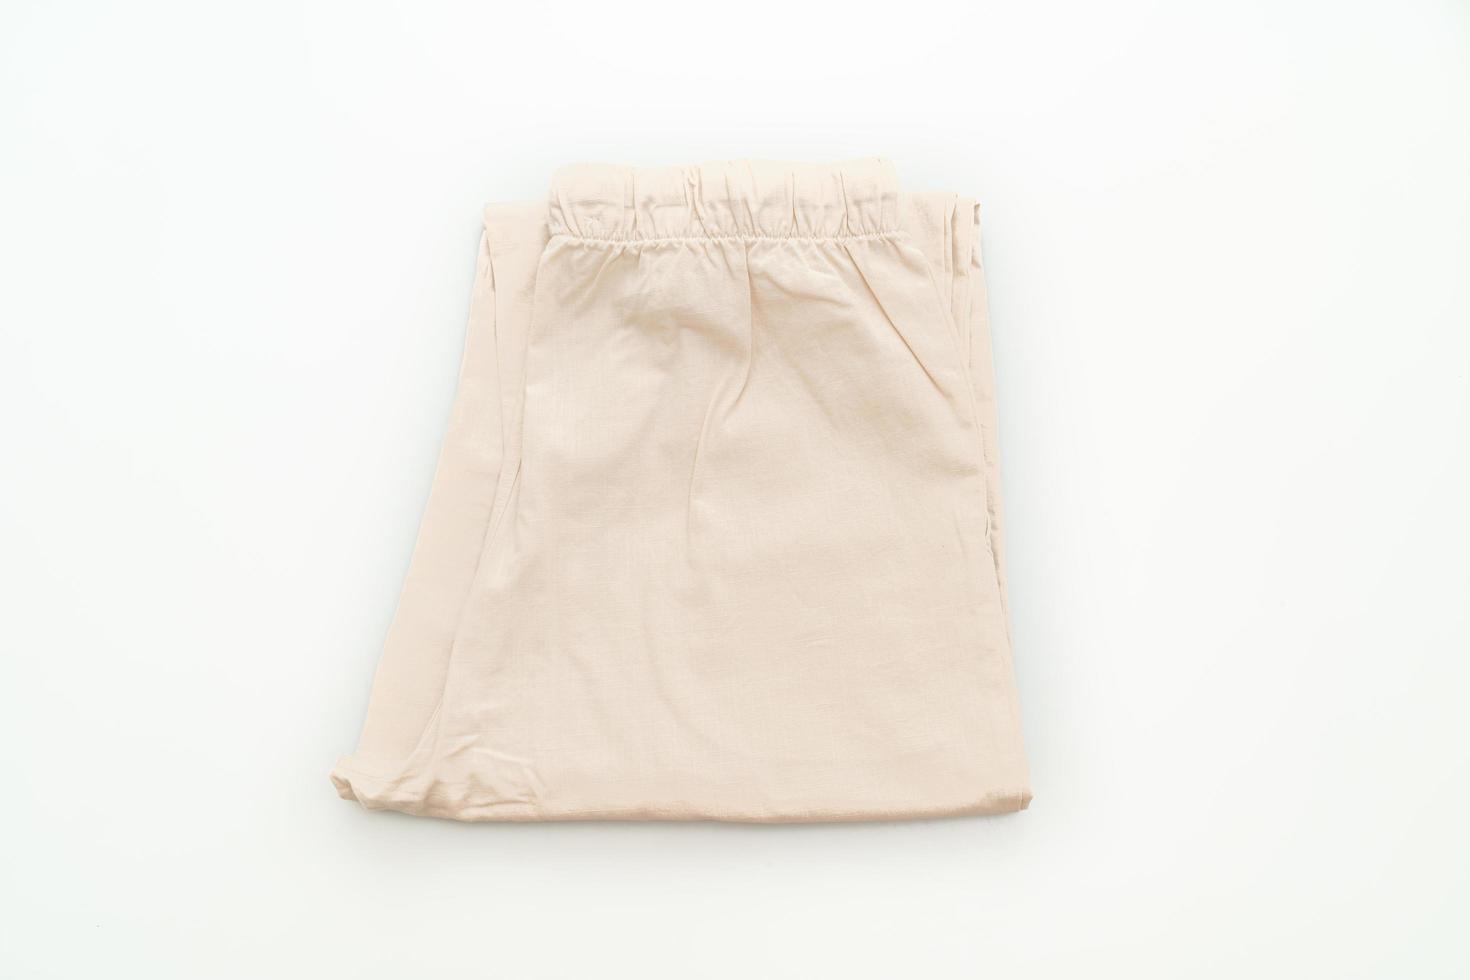 vikta beige byxa isolerad på vit bakgrund foto